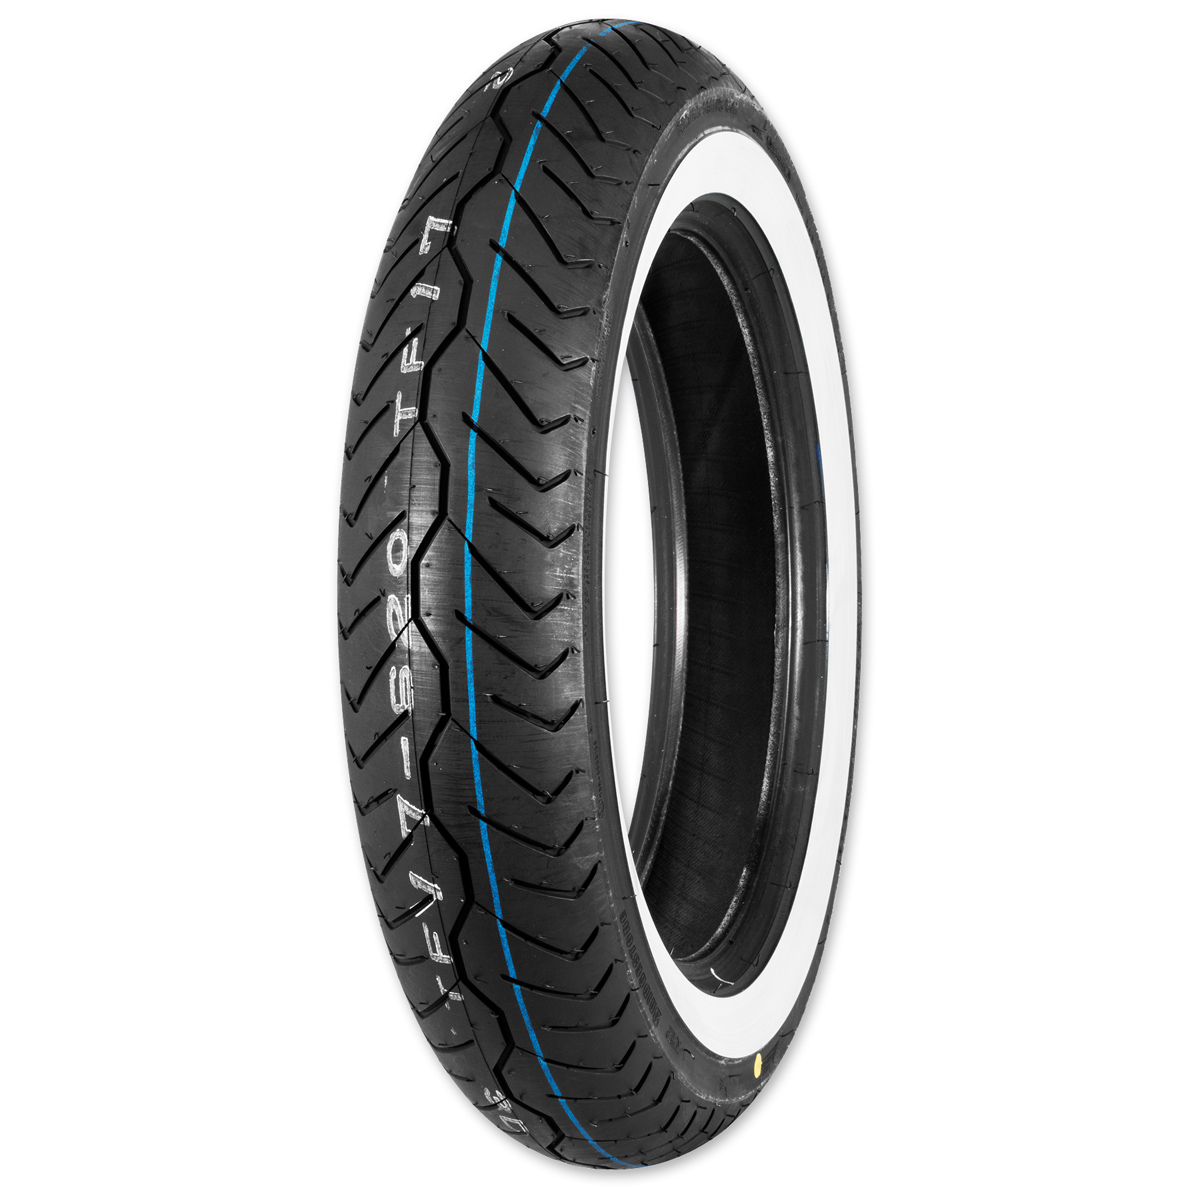 Bridgestone G721-G 130/90-16 Front Tire